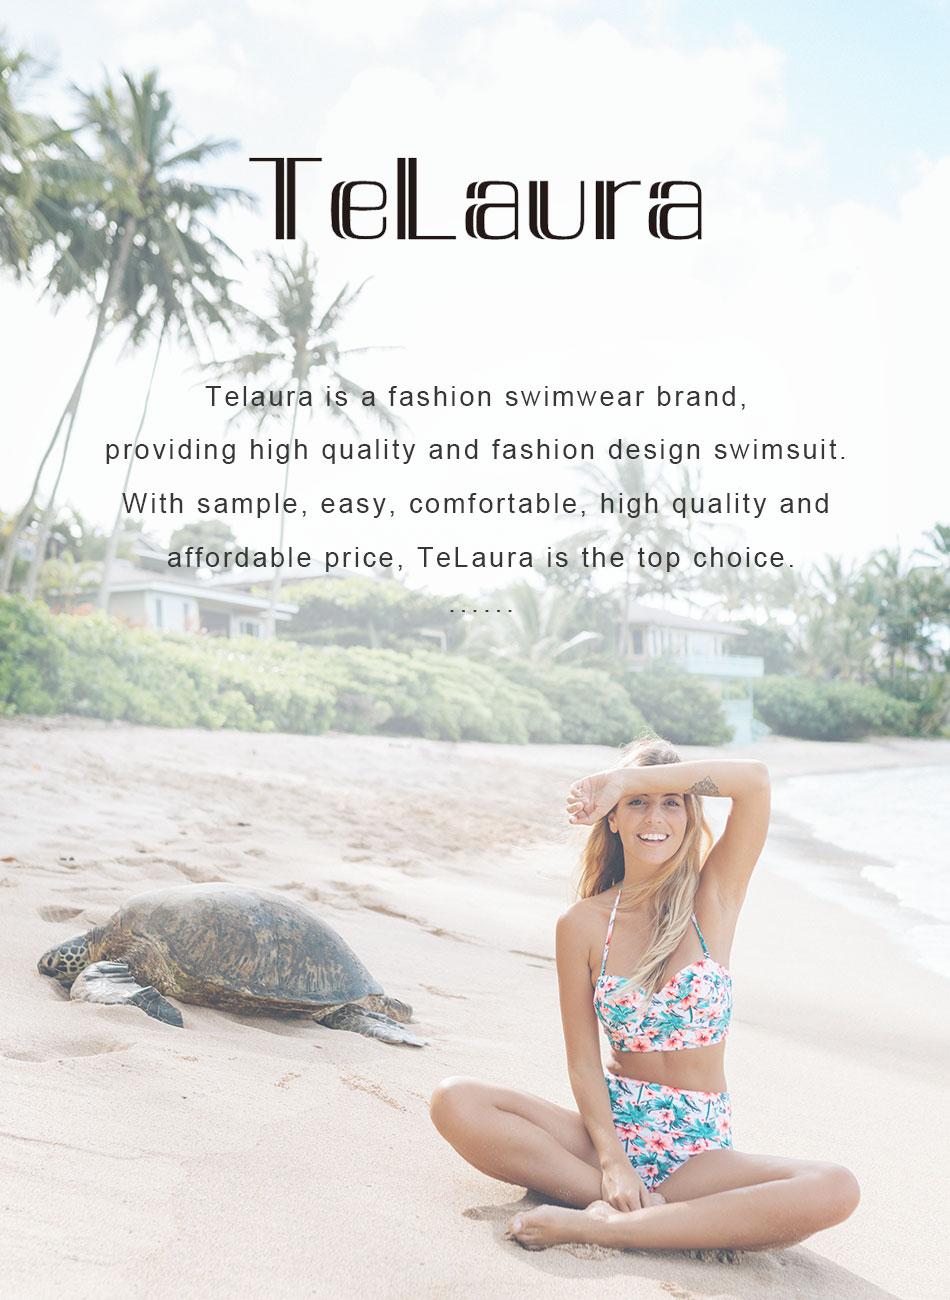 H8acd8673b981461daee6f746d9e763bbd 2019 New Sexy High Waist Bikini Swimwear Women Swimsuit Push Up Ruffle Bathing Suit Biquini Plus Size Swimwear Female Beach Wear